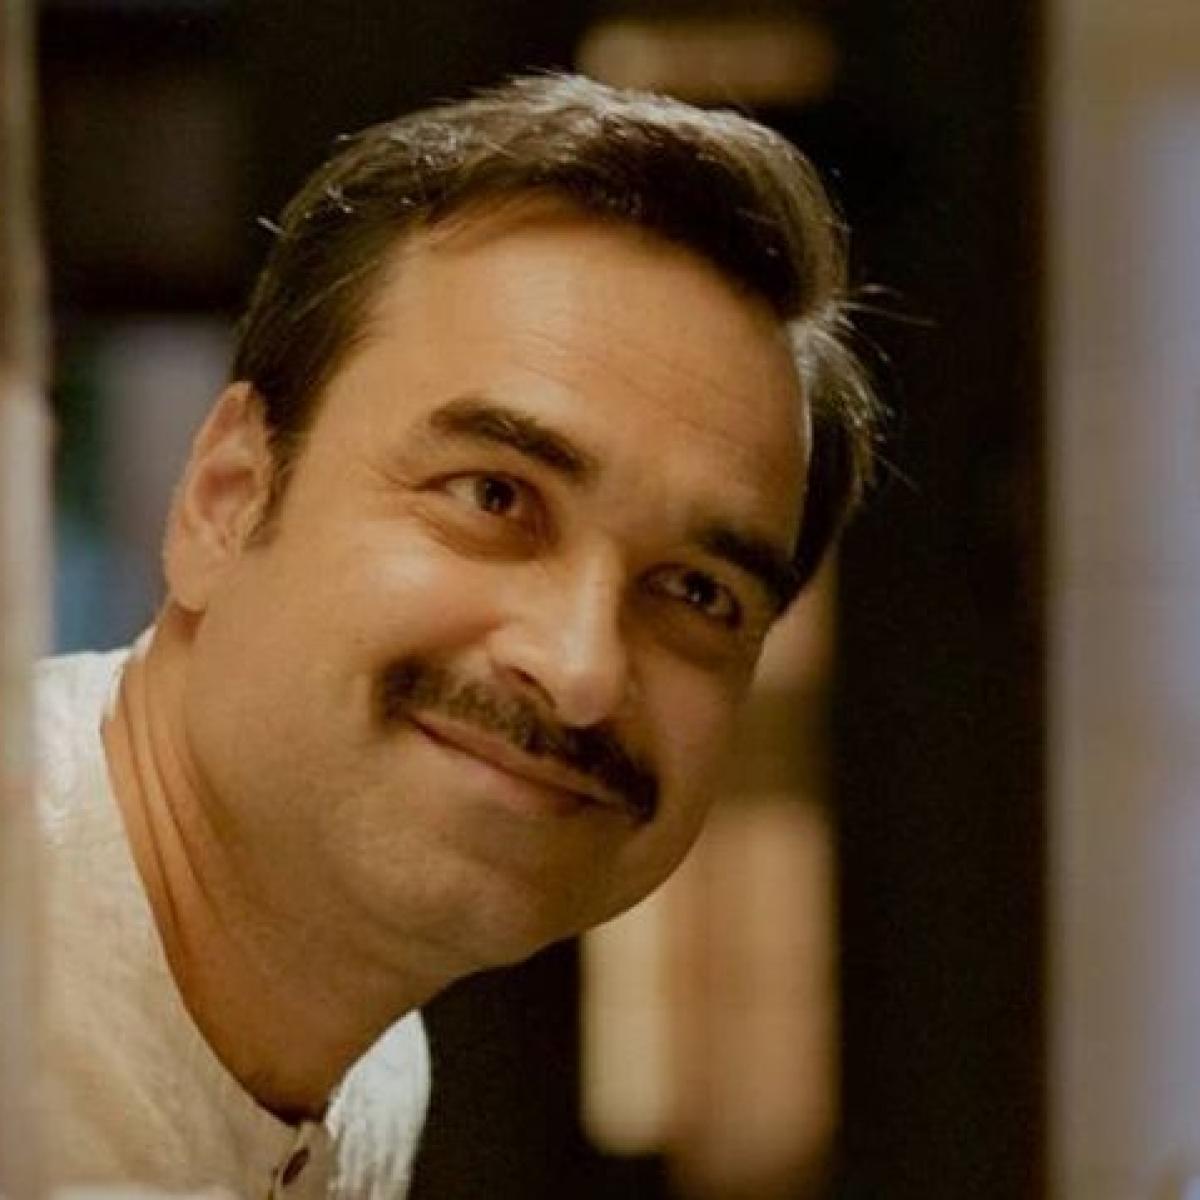 Pankaj Tripathi joins Akshay Kumar, Kriti Sanon, Jacqueline Fernandez in 'Bachchan Pandey'